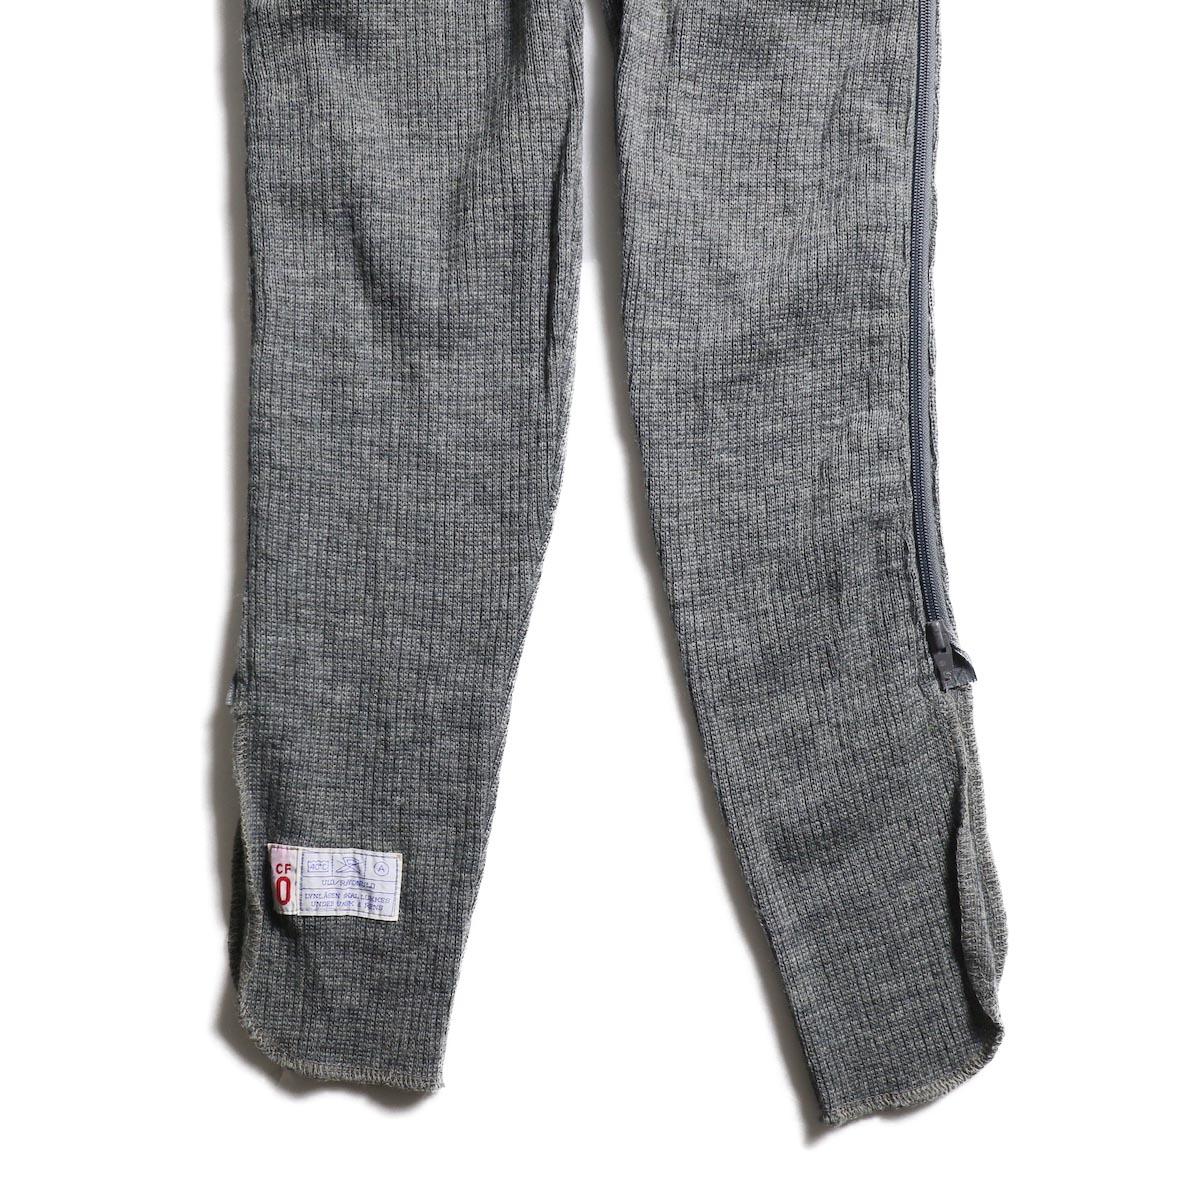 Denmark Military / Side Zip Under Pants (Medium) (C)